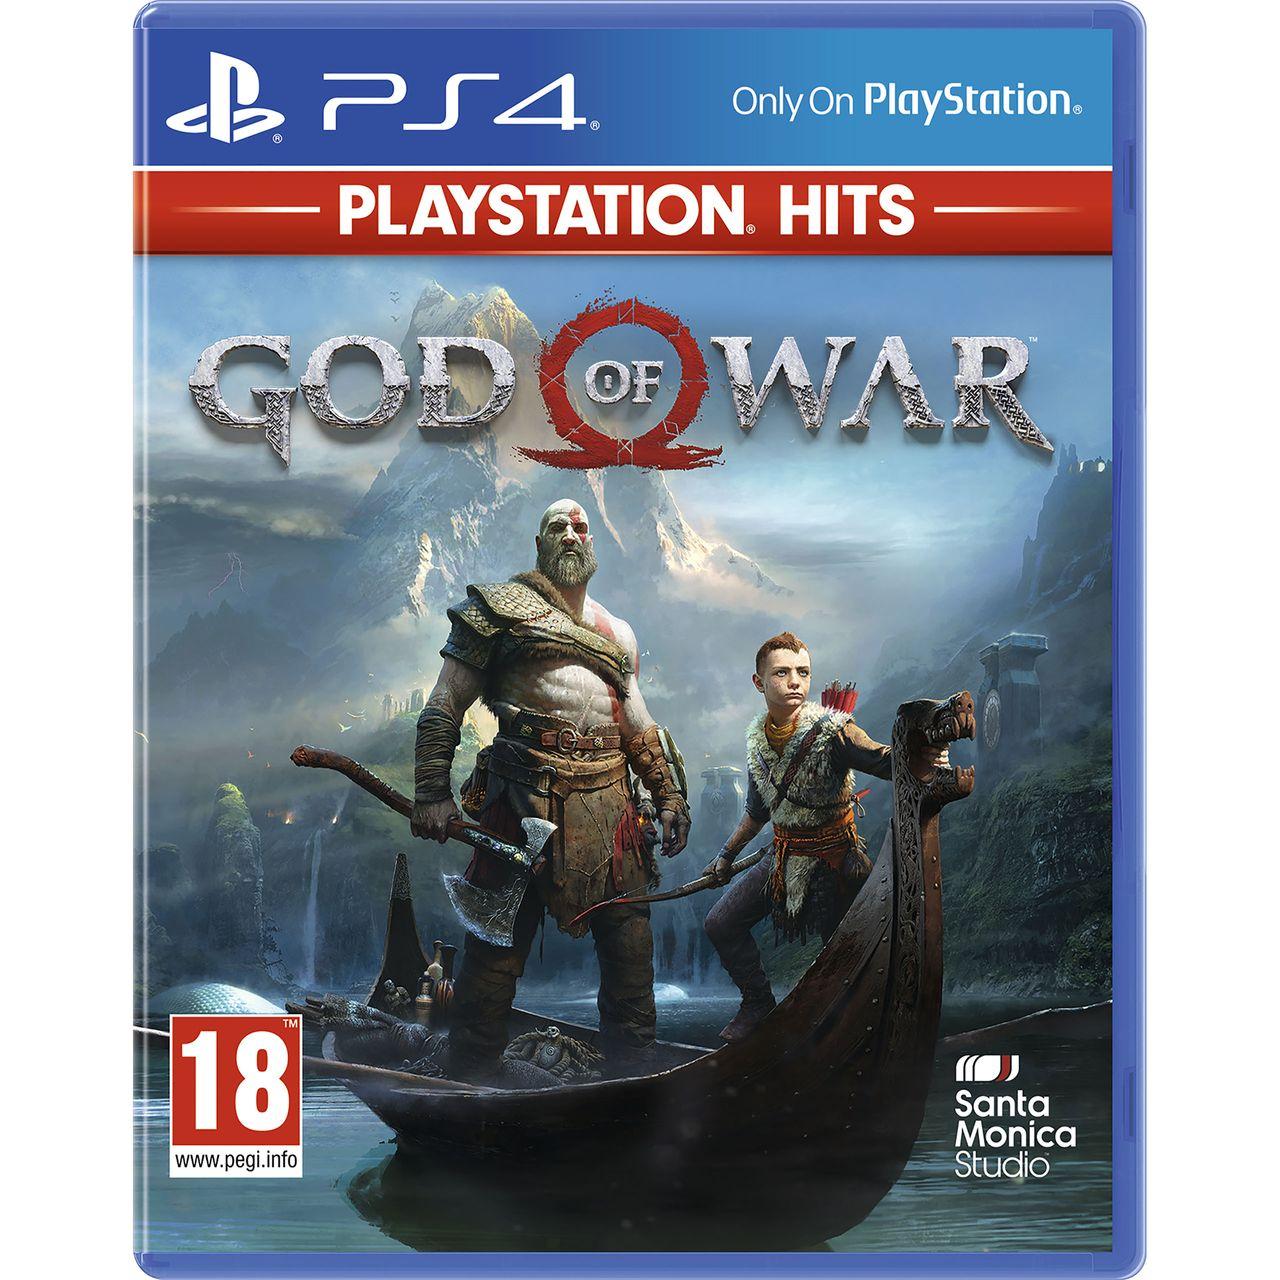 God Of War Playstation Hits (PS4) - £10 Delivered @ AO